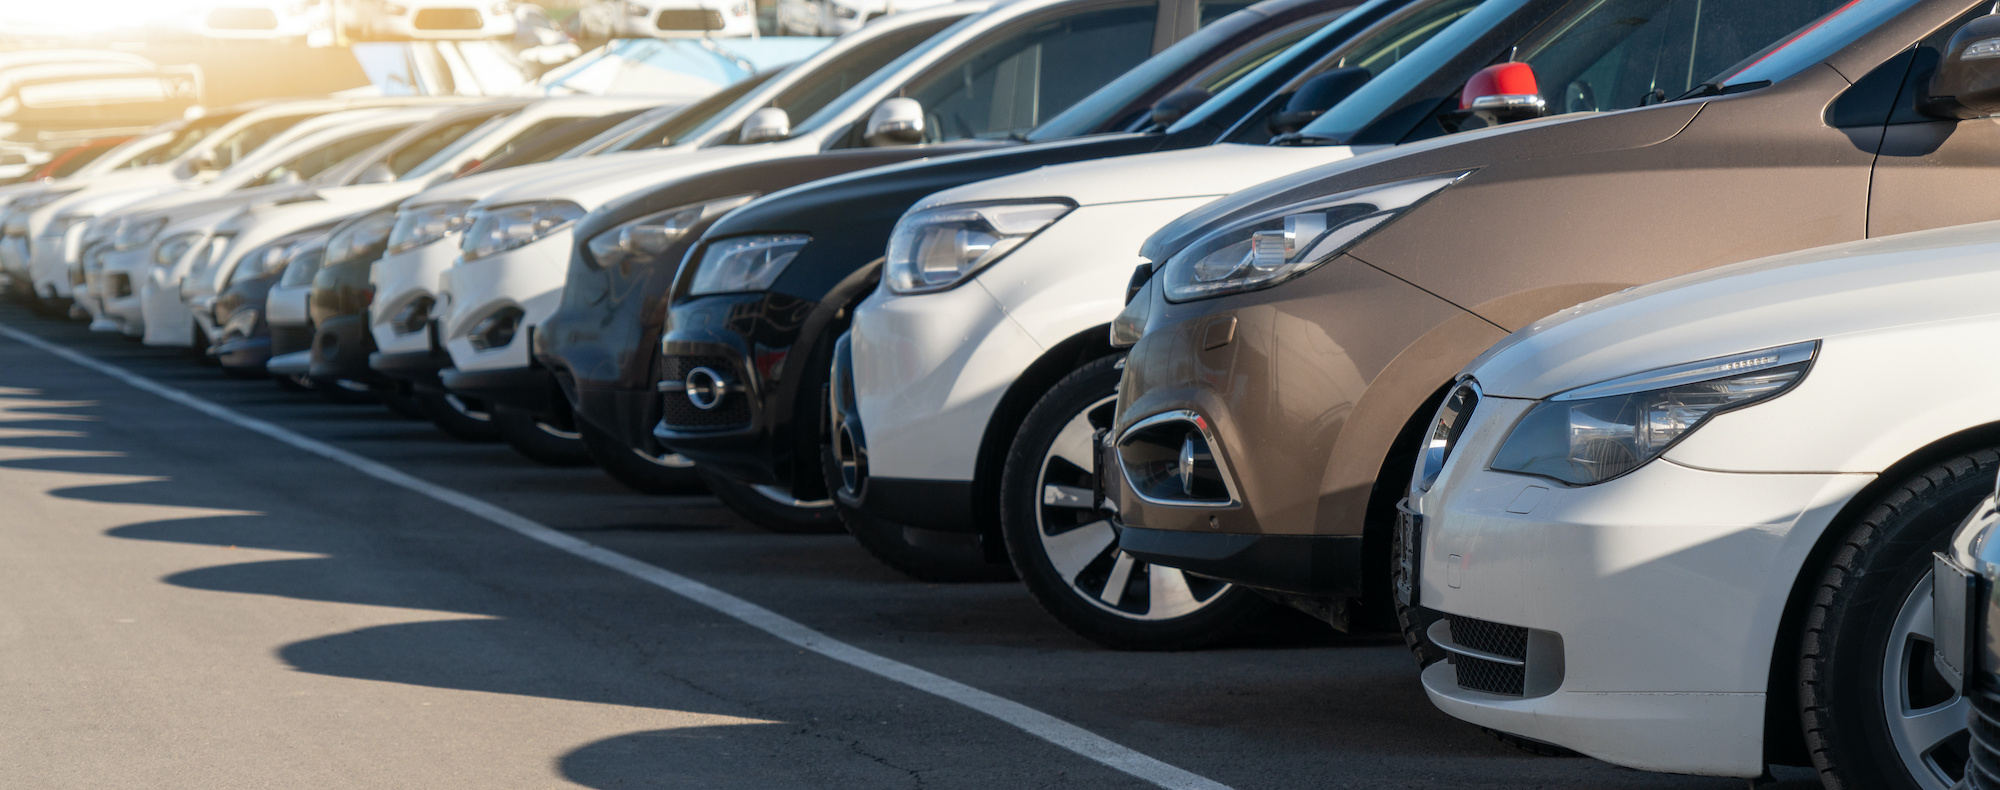 auto dealership loss control